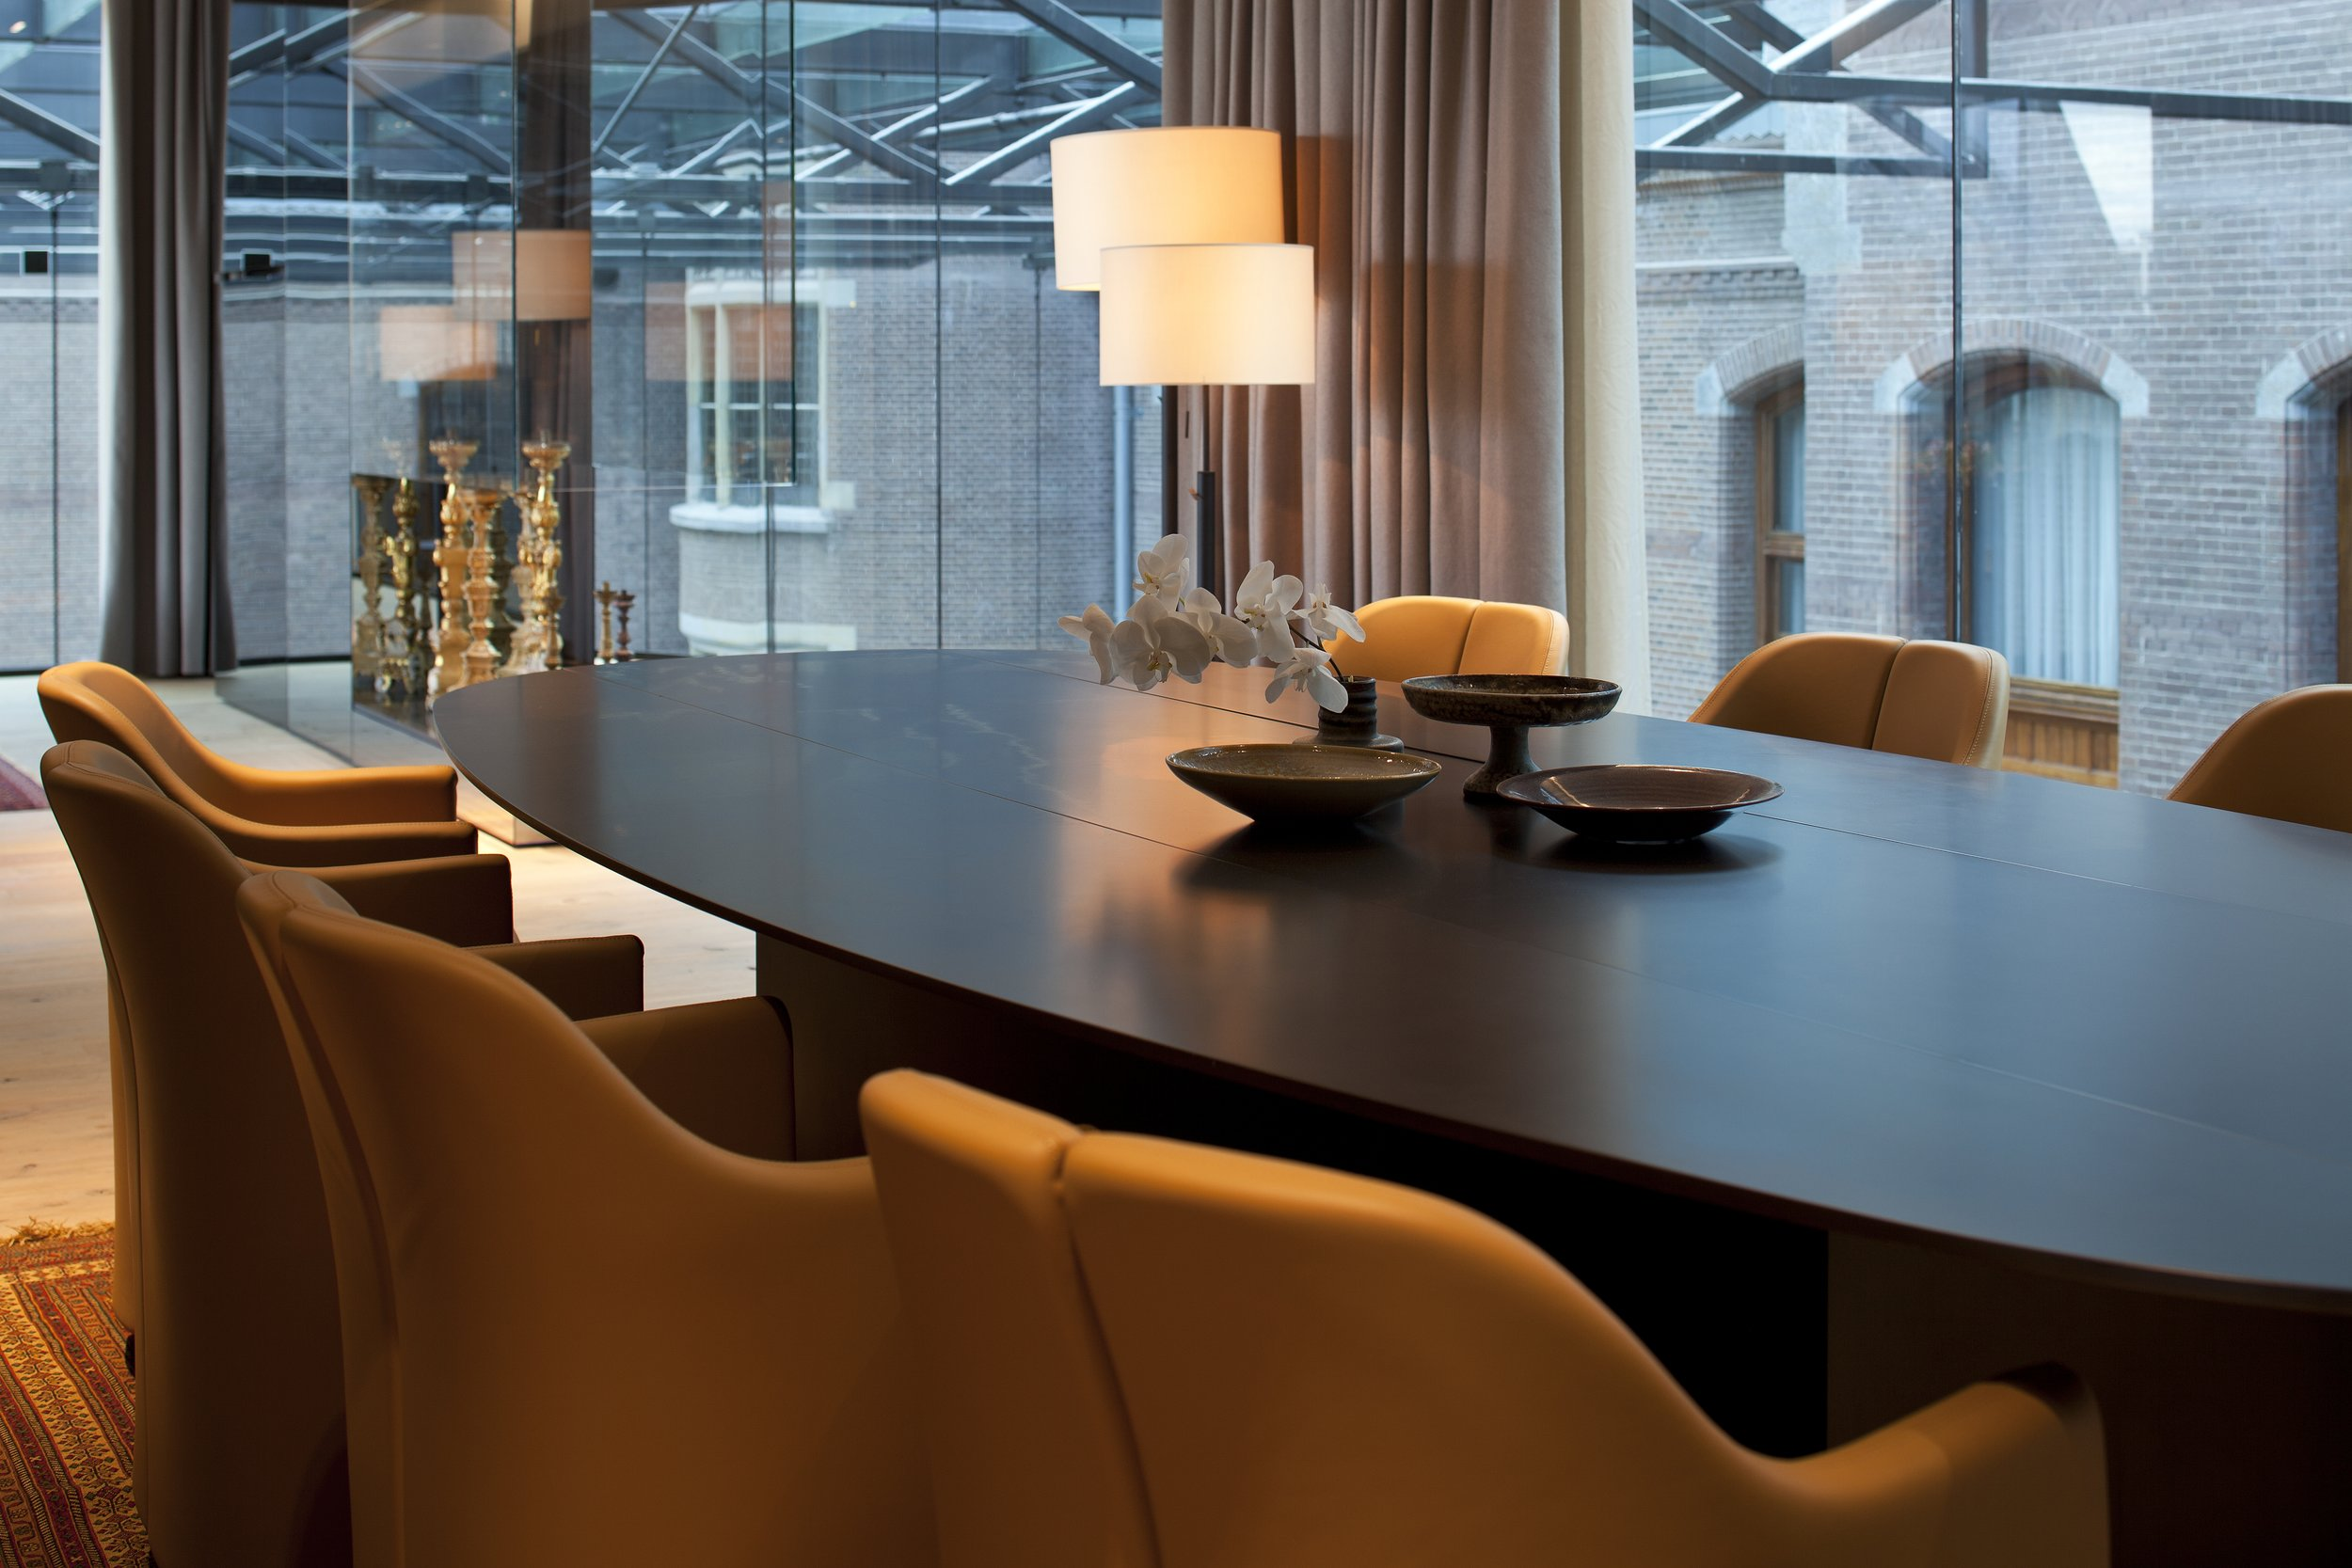 AG_CONSERVATORIUM_HOTEL_Penthouse Room_011.jpeg